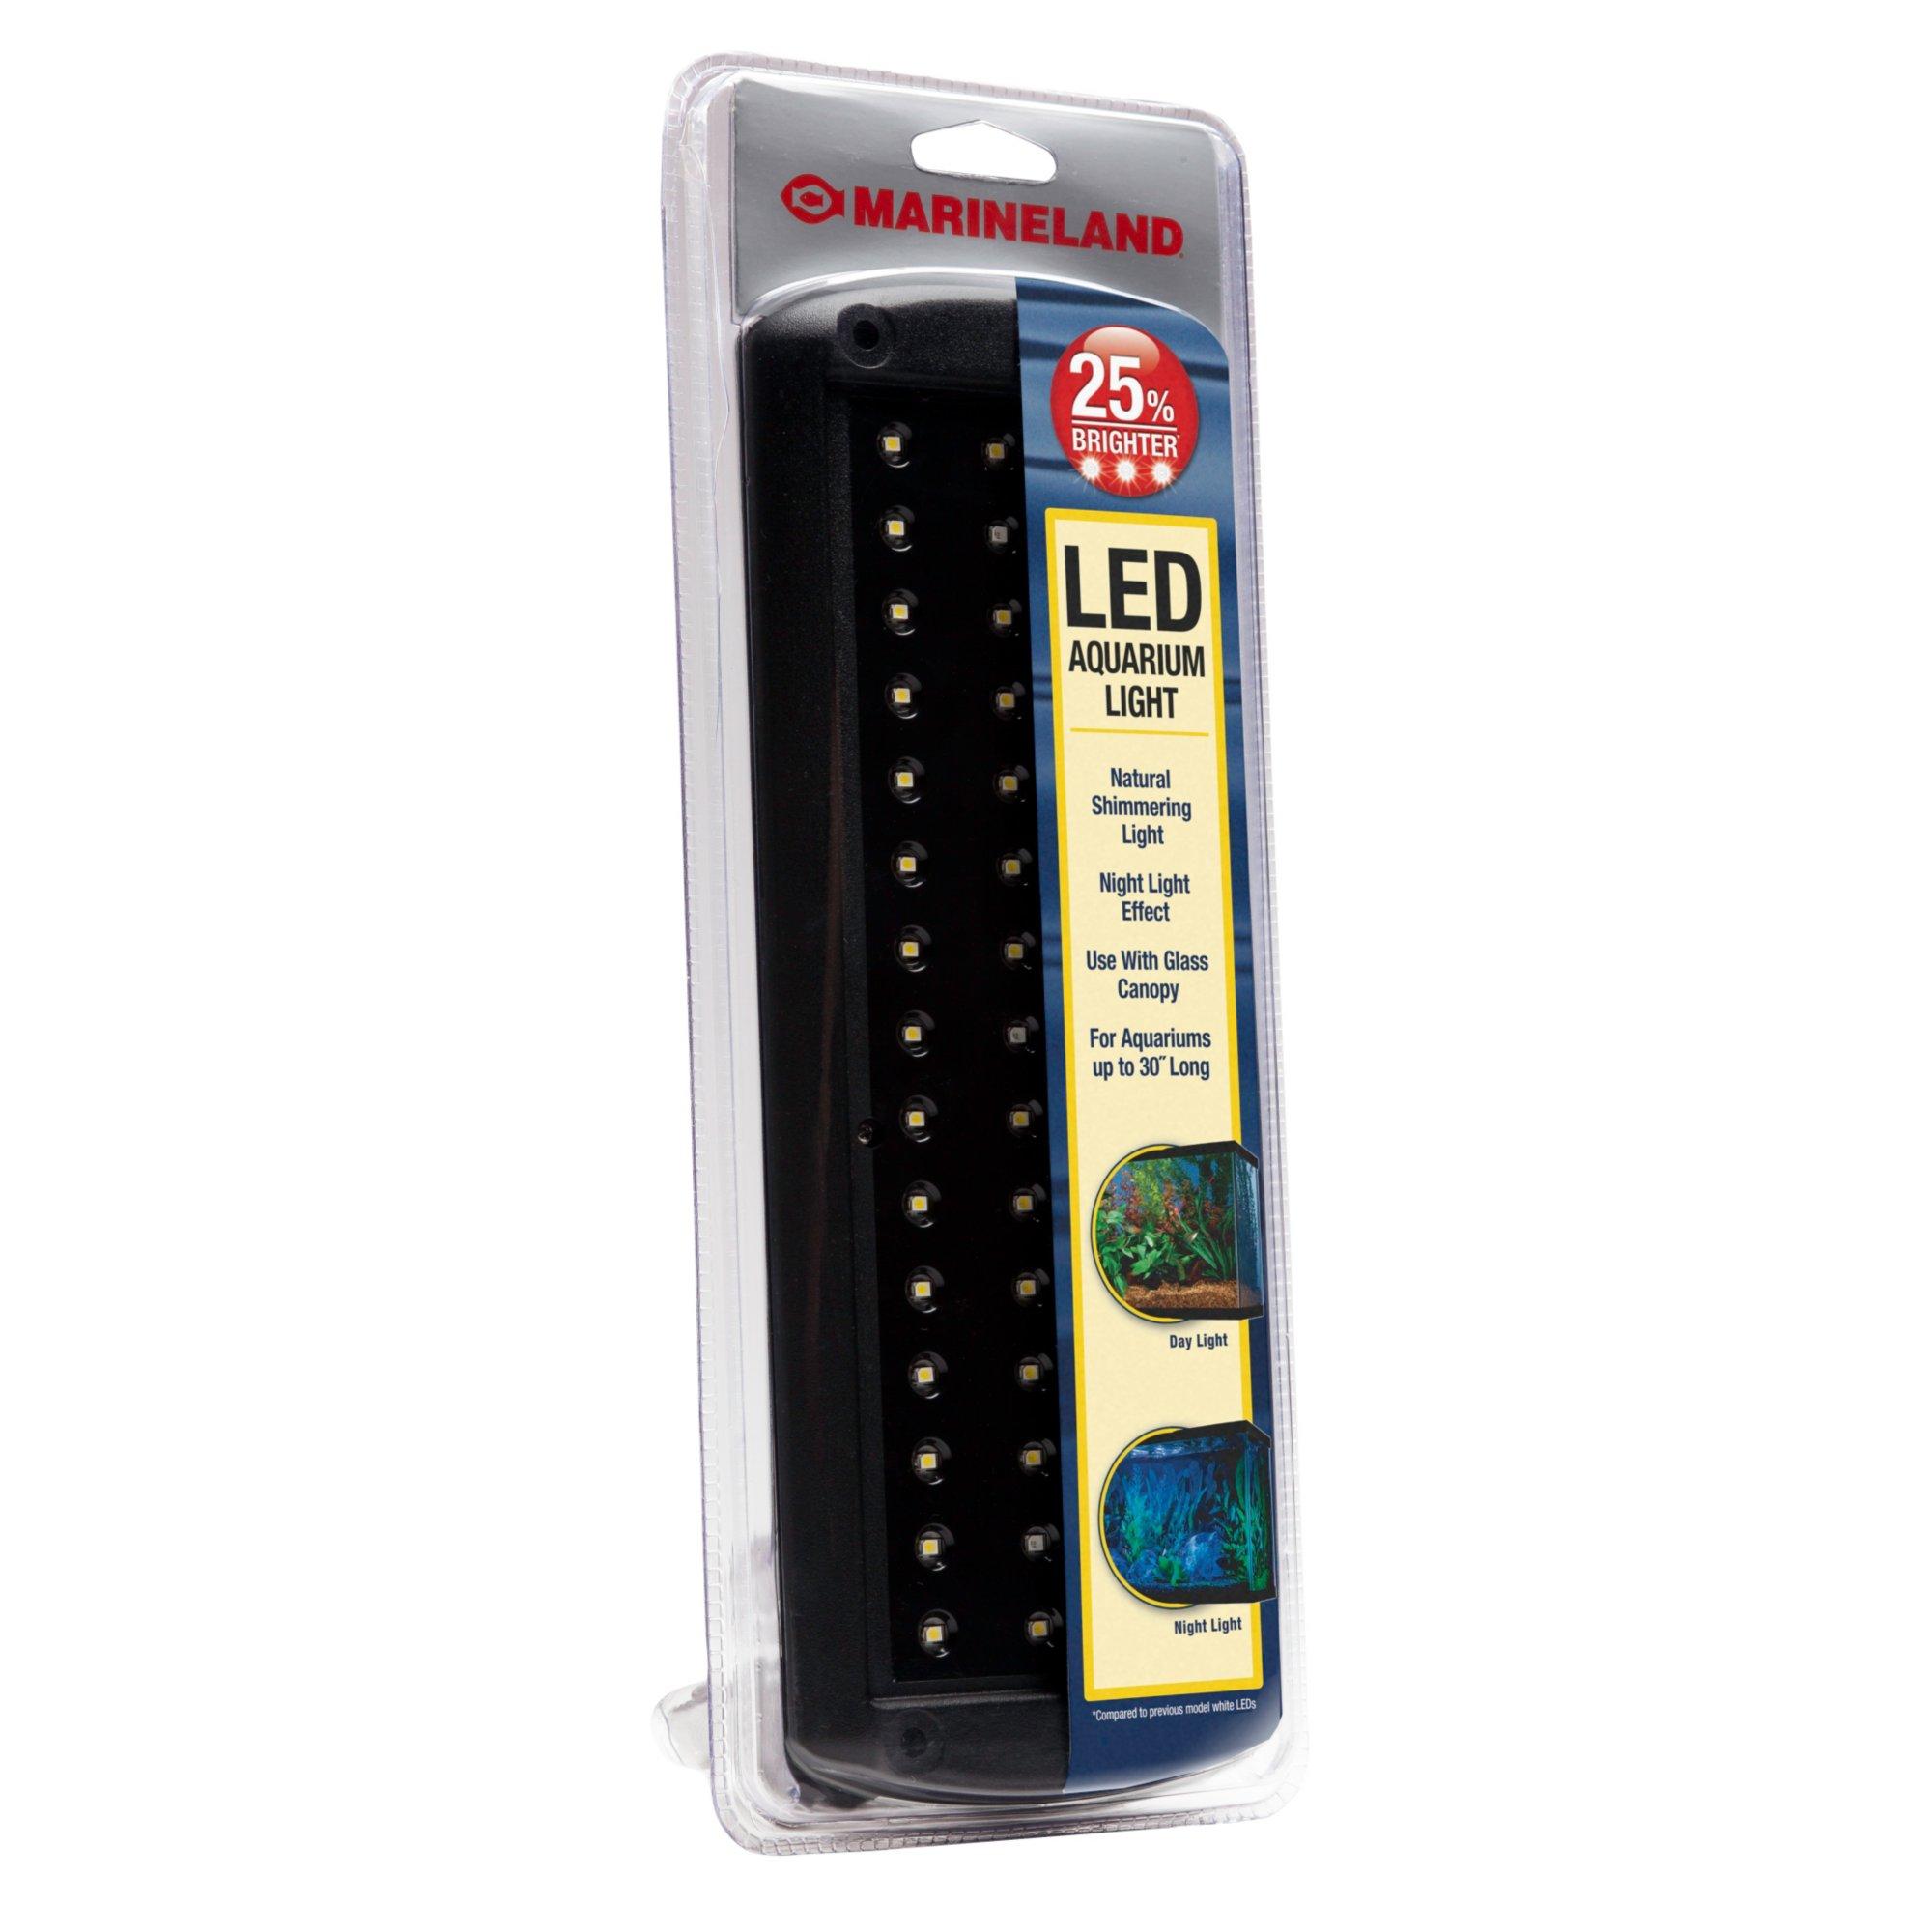 Marineland LED Aquarium Light Bar | Petco